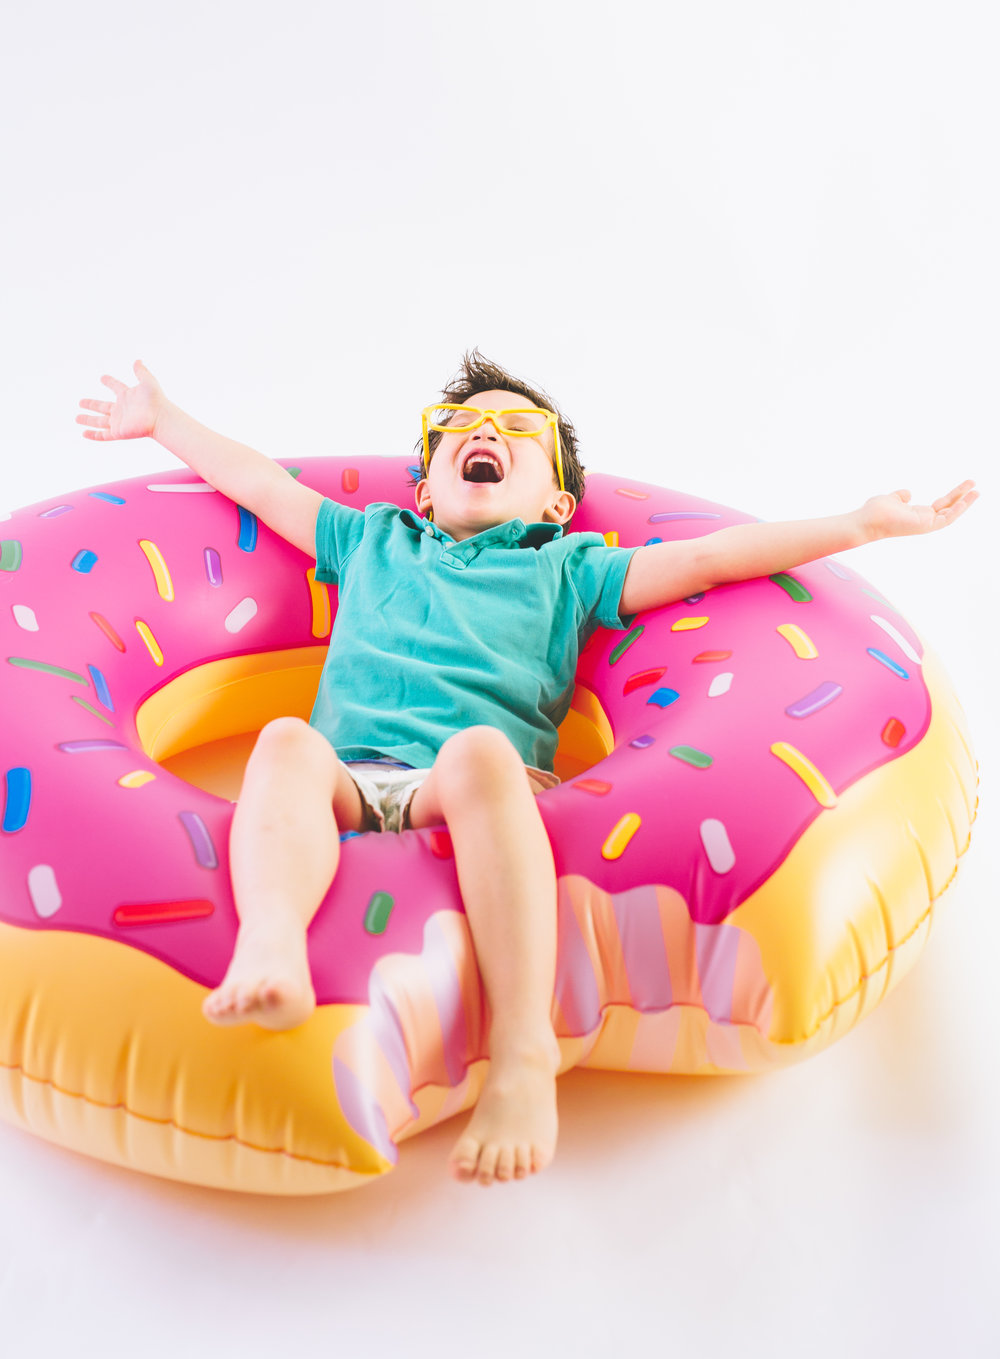 donut-8239.jpg